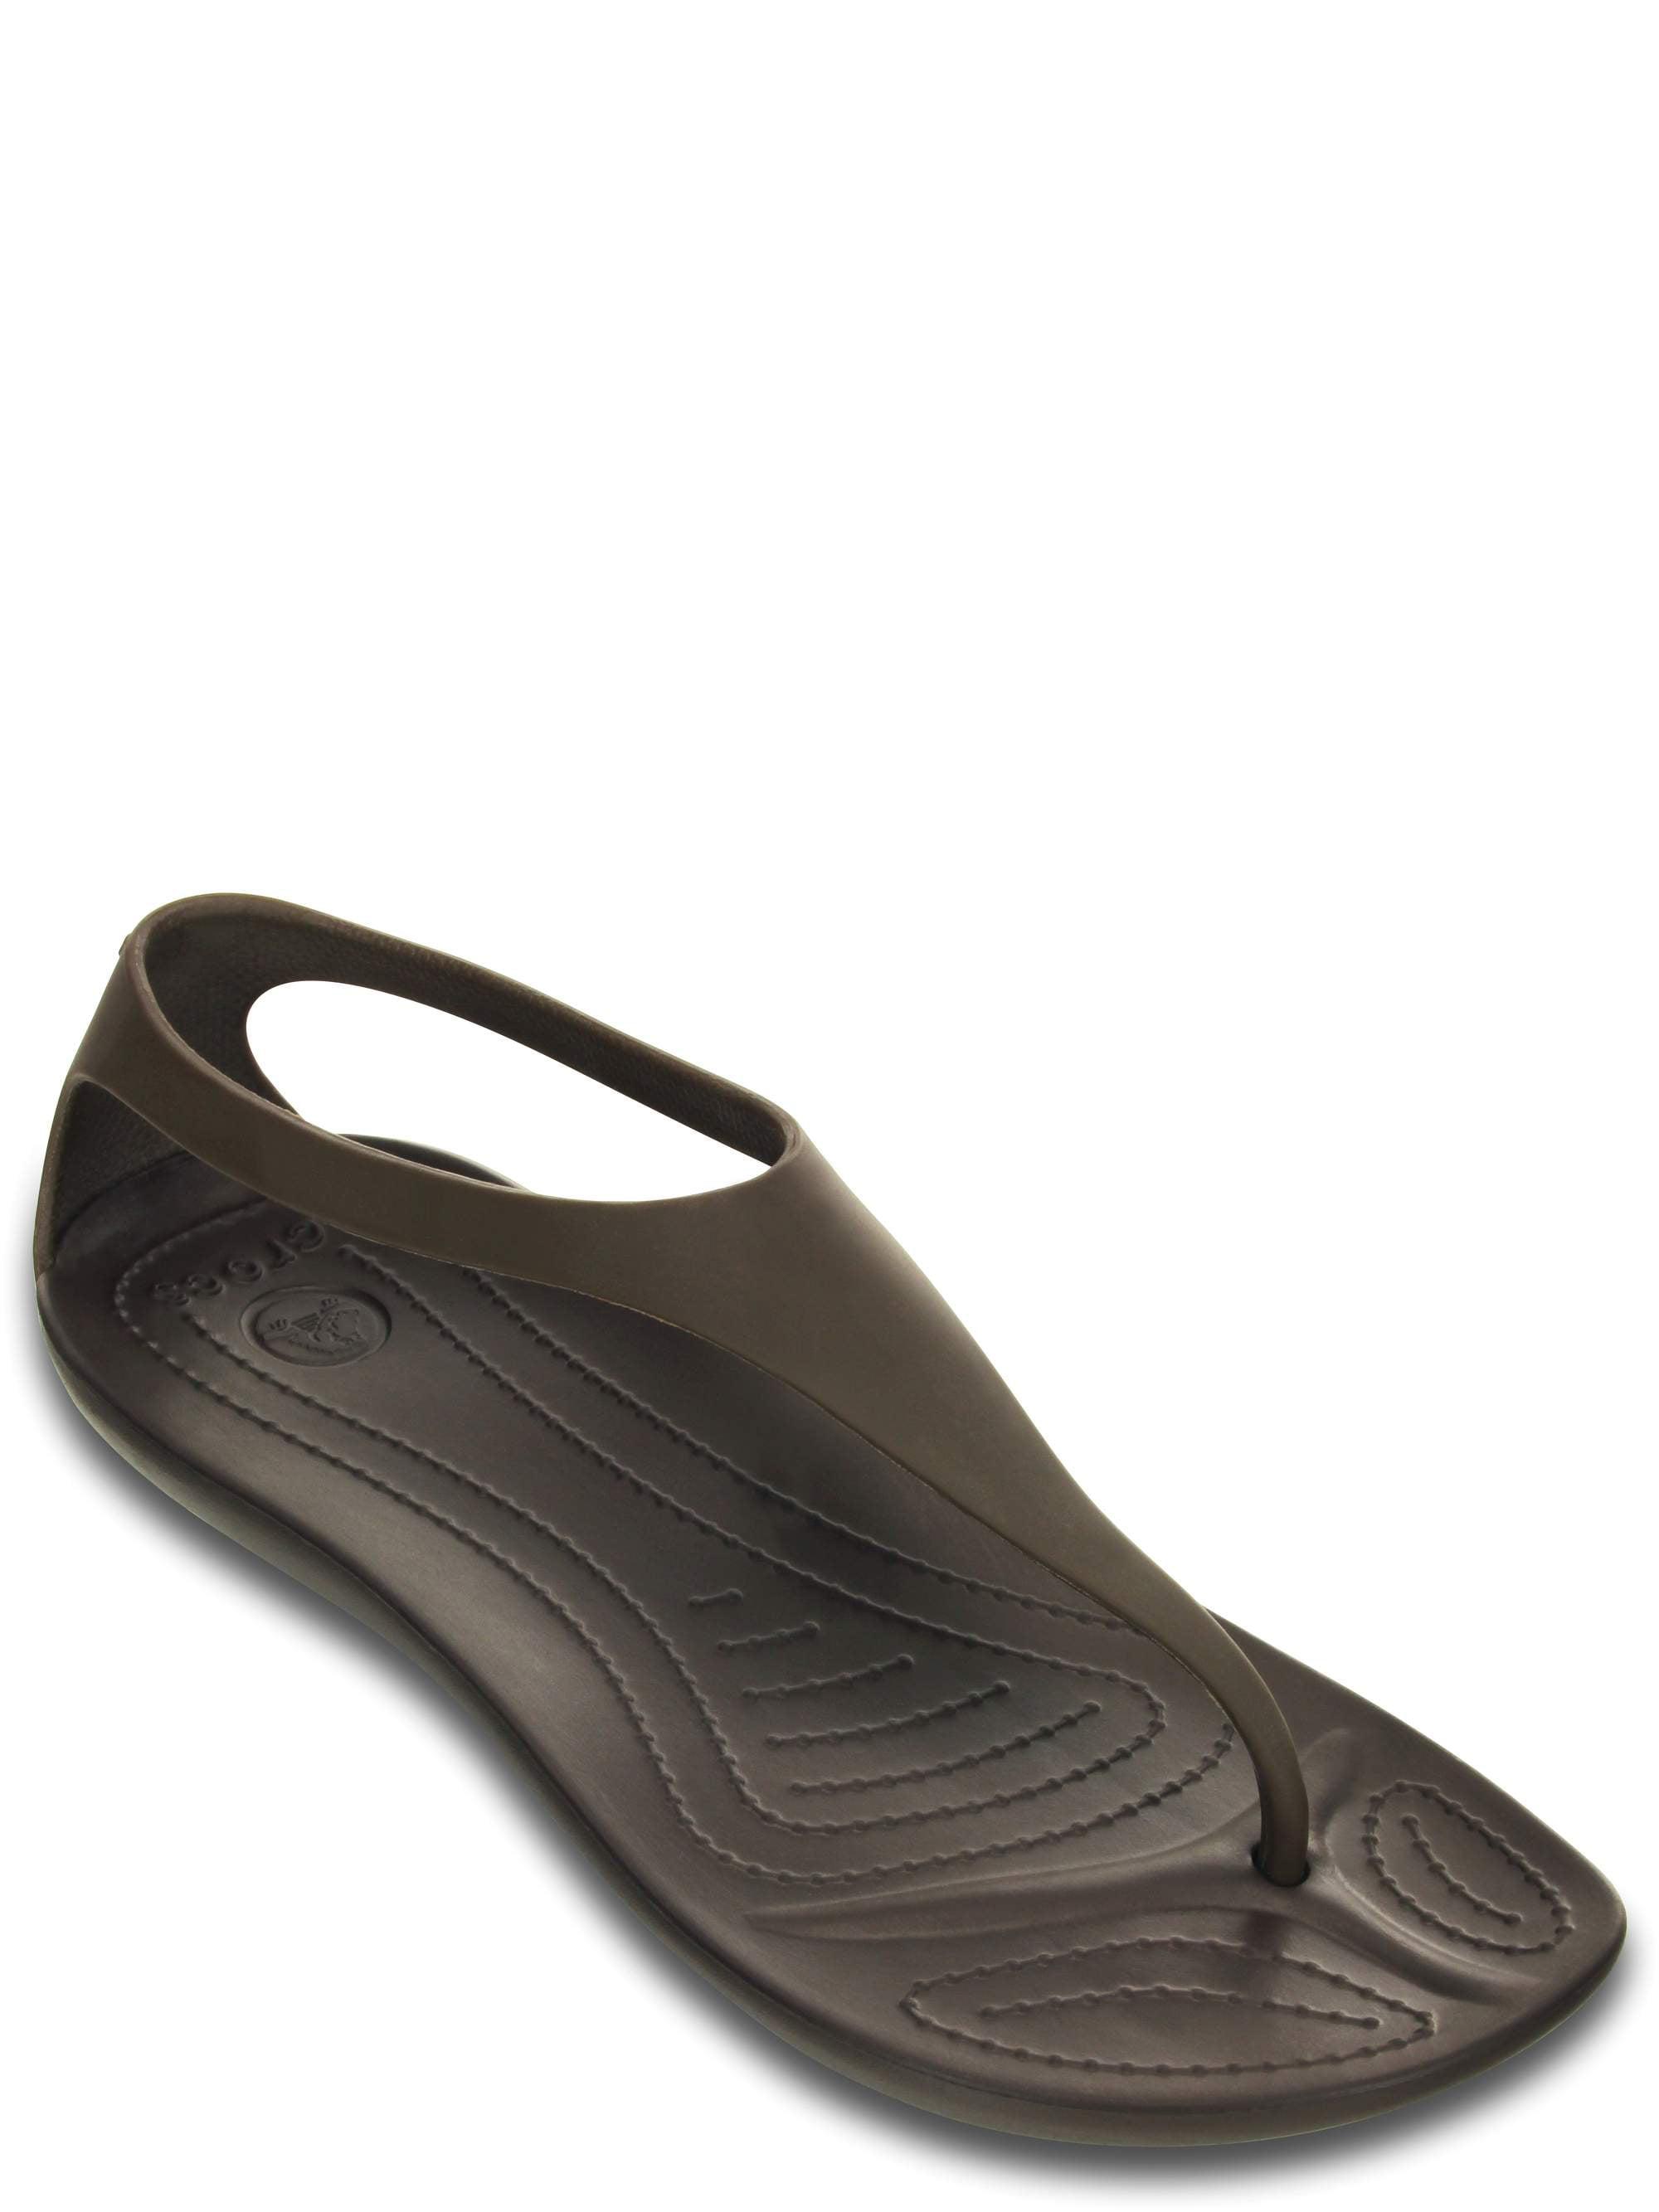 äkta kvalitet bra erbjudanden 2017 beställa Crocs - Crocs Women's Sexi Flip Sandals - Walmart.com